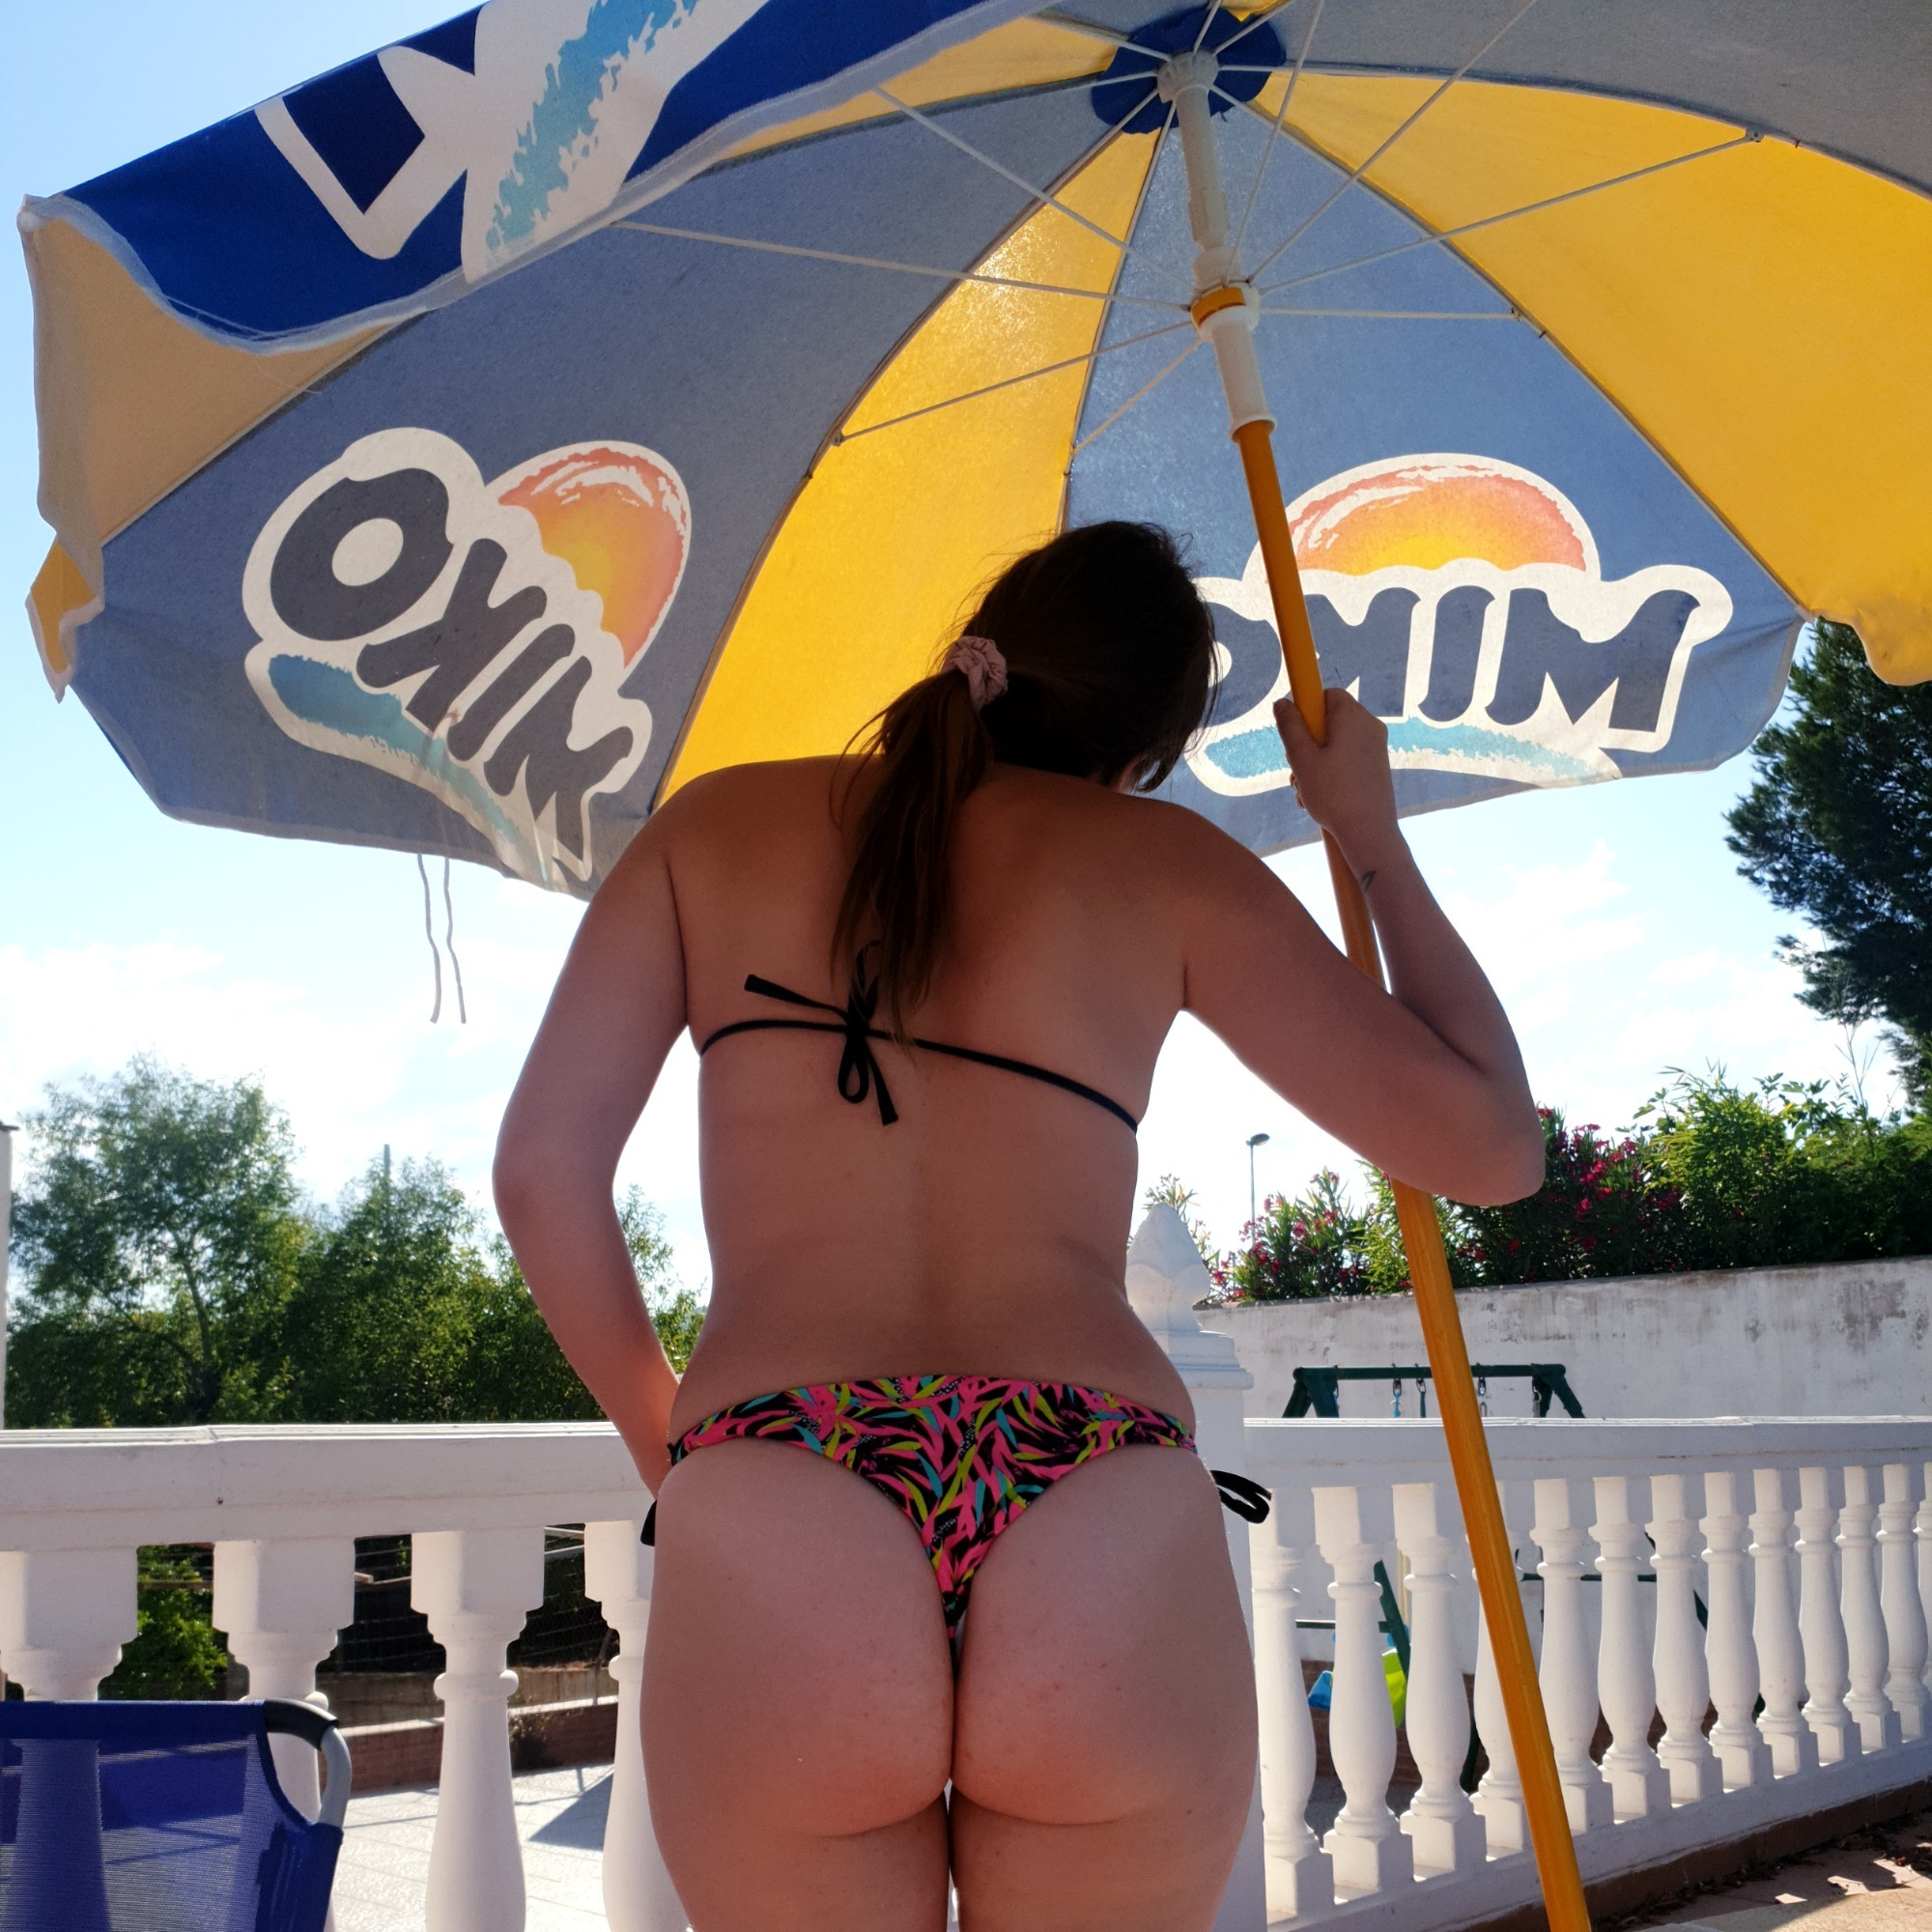 fotos mujeres desnudas, imagenes sexo casero